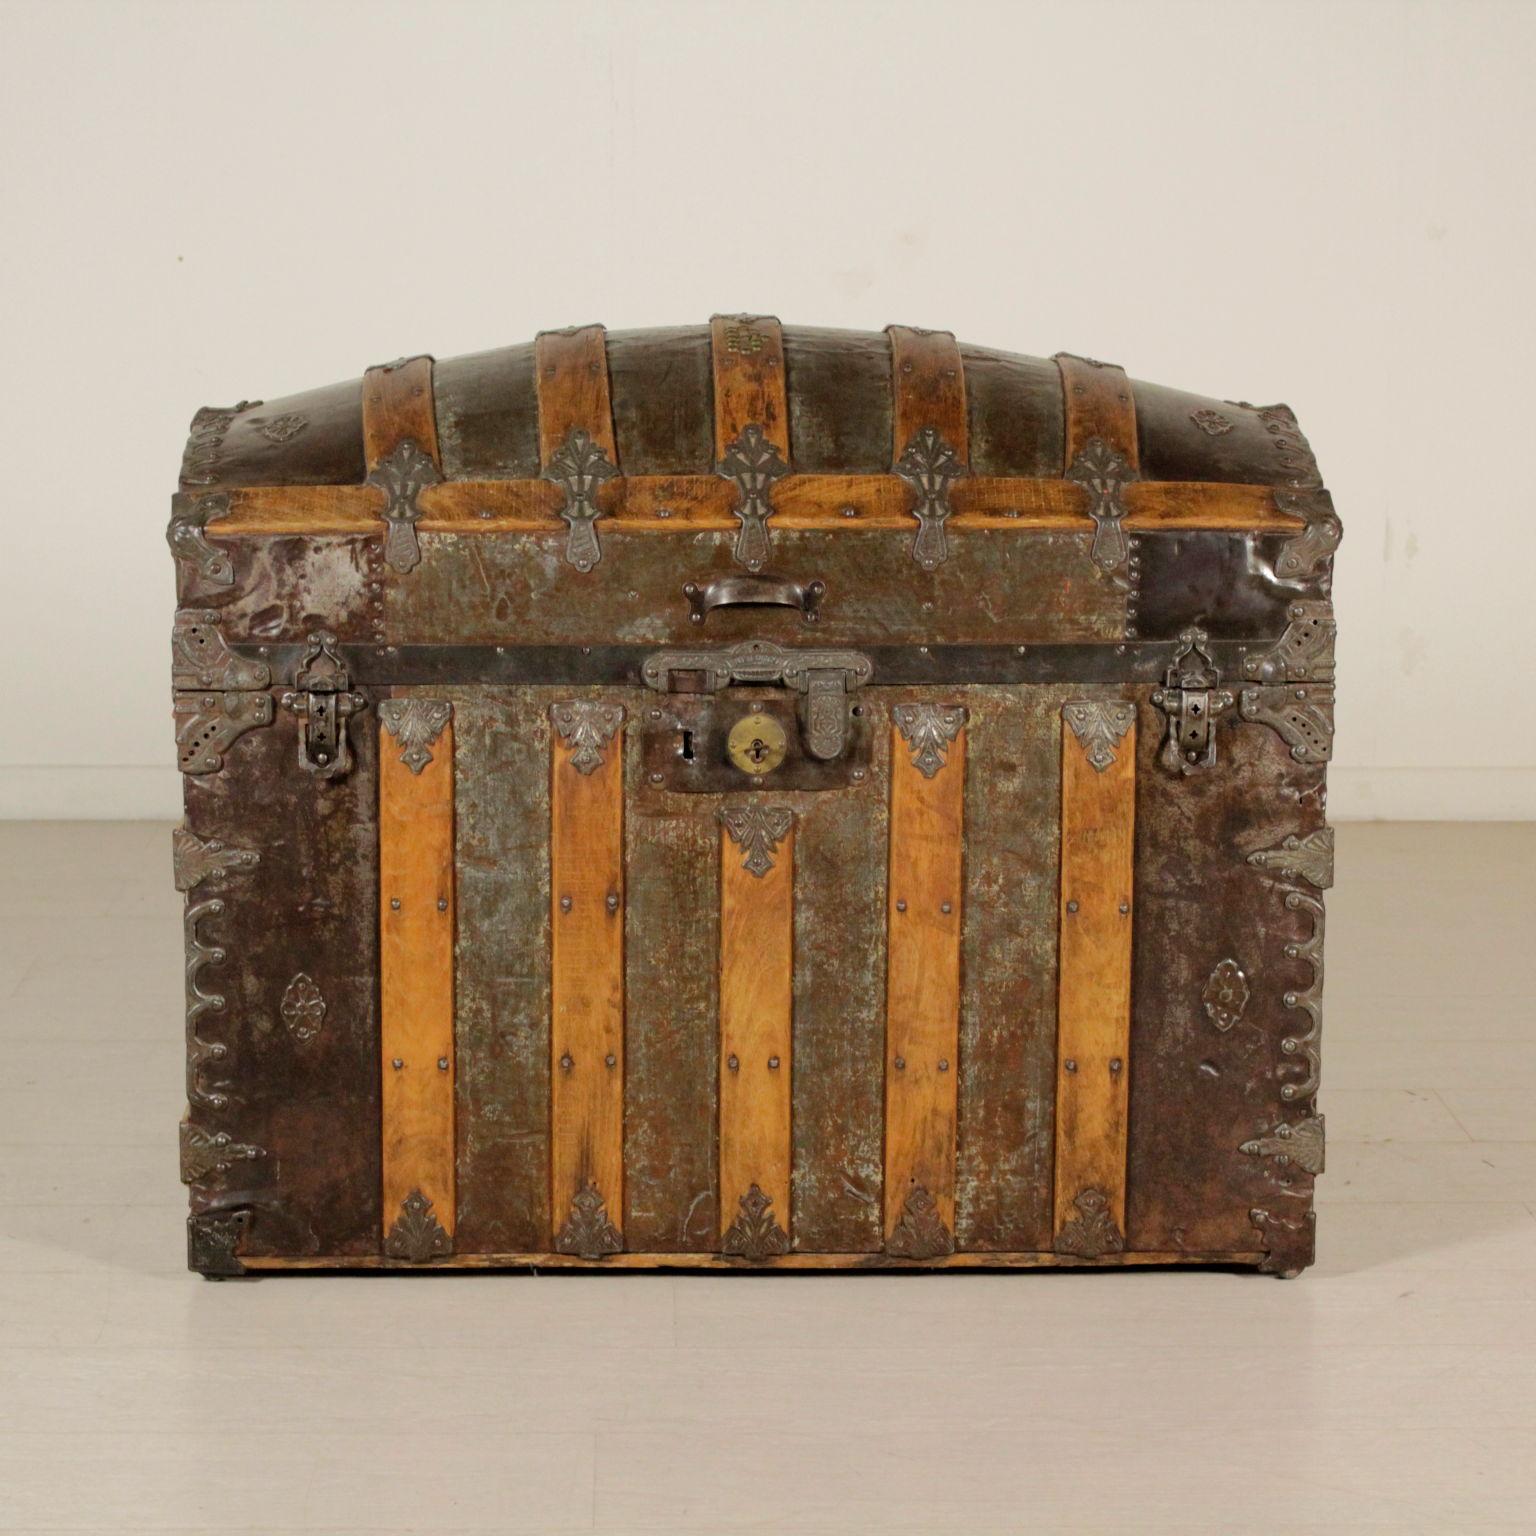 Baule saratoga altri mobili antiquariato for Antiquariato mobili